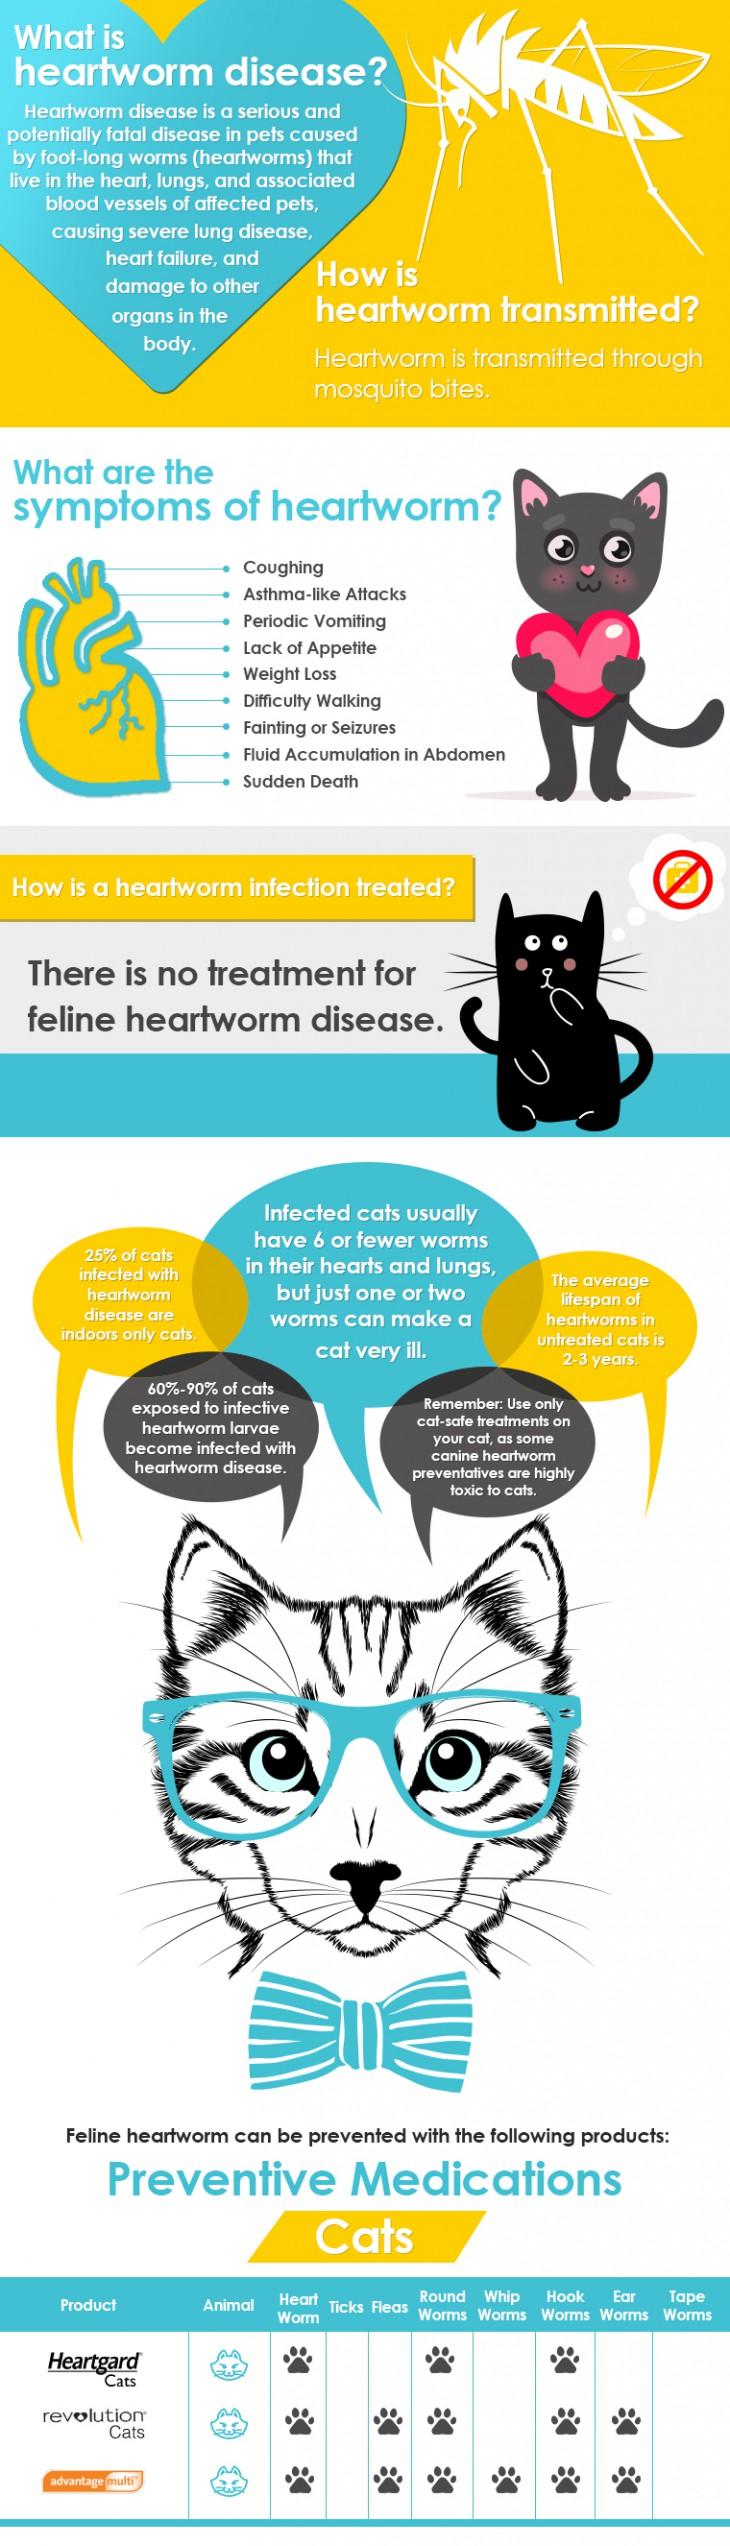 Noelito Flow Heartworm Cat Diseases Heartworm Prevention